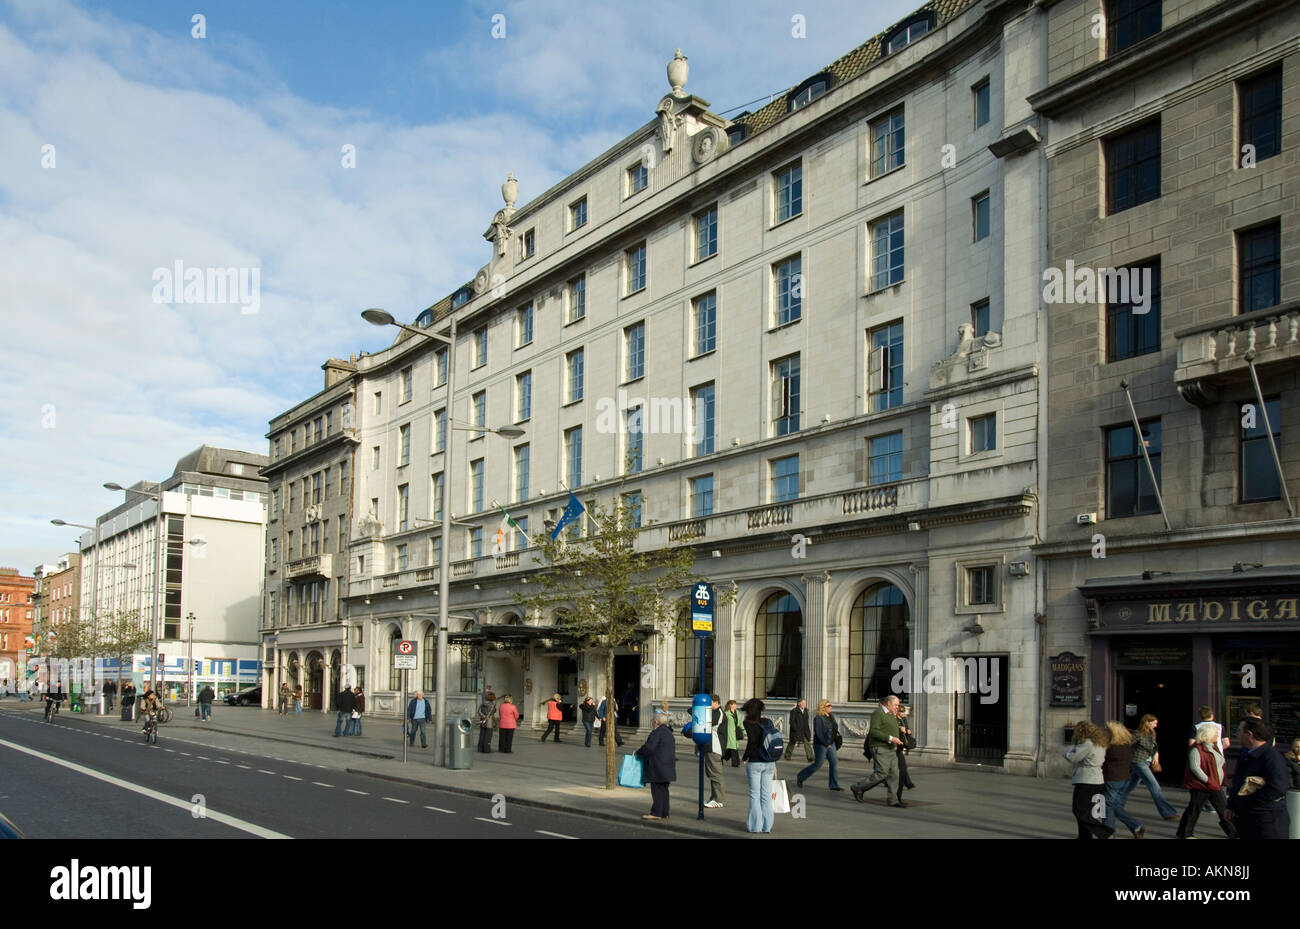 The Gresham Hotel on O Connell Street Dublin Ireland Stock ...